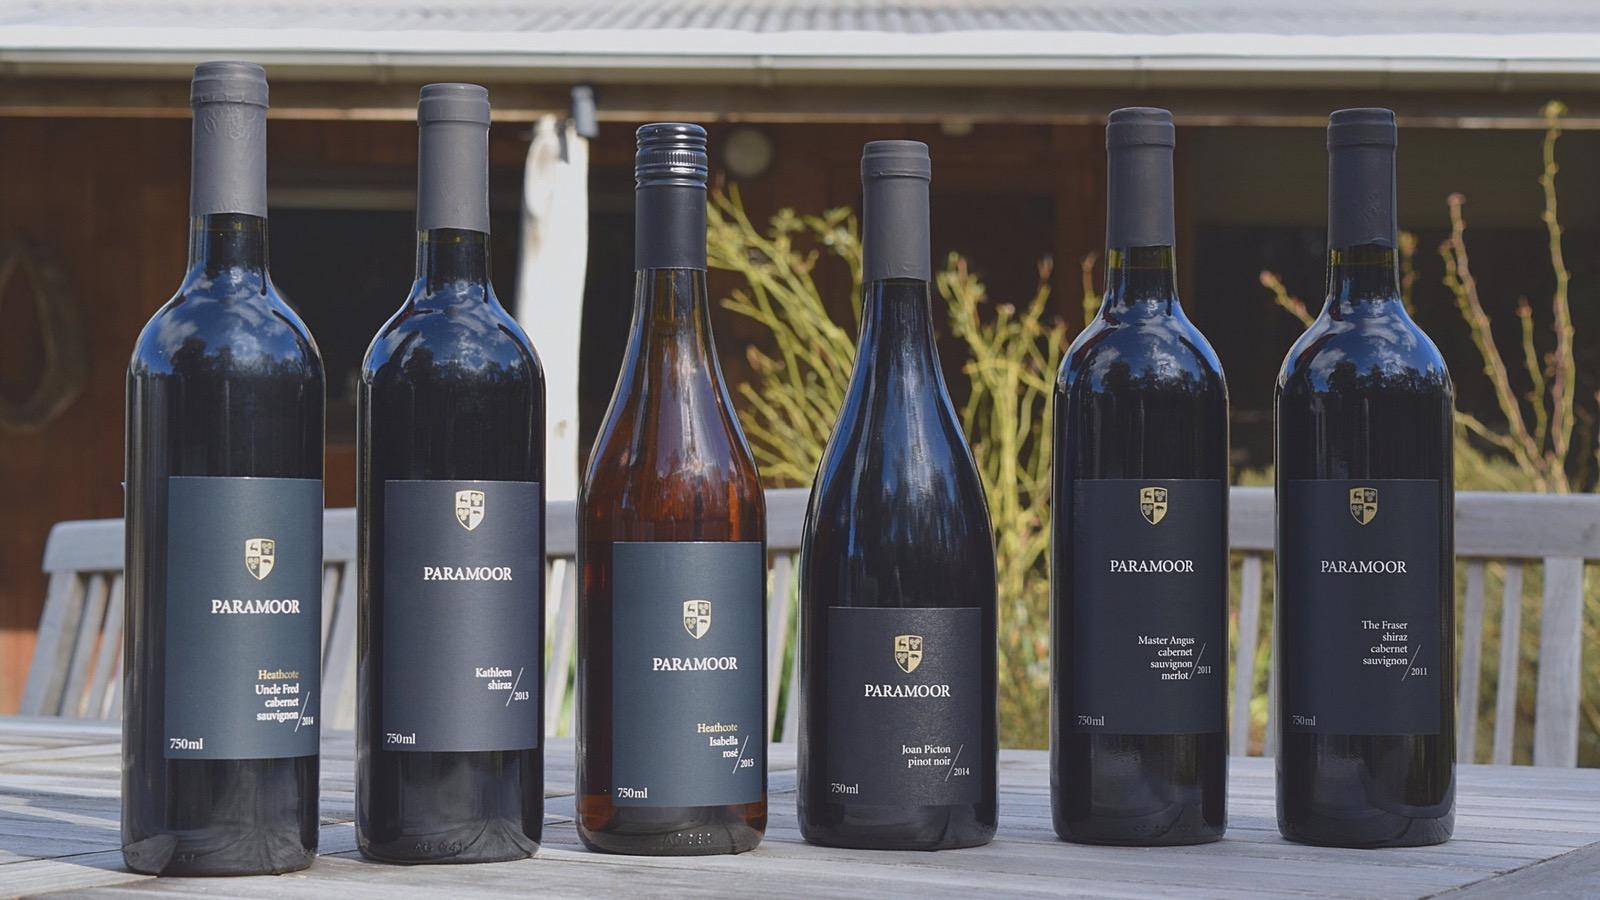 Paramoor wines